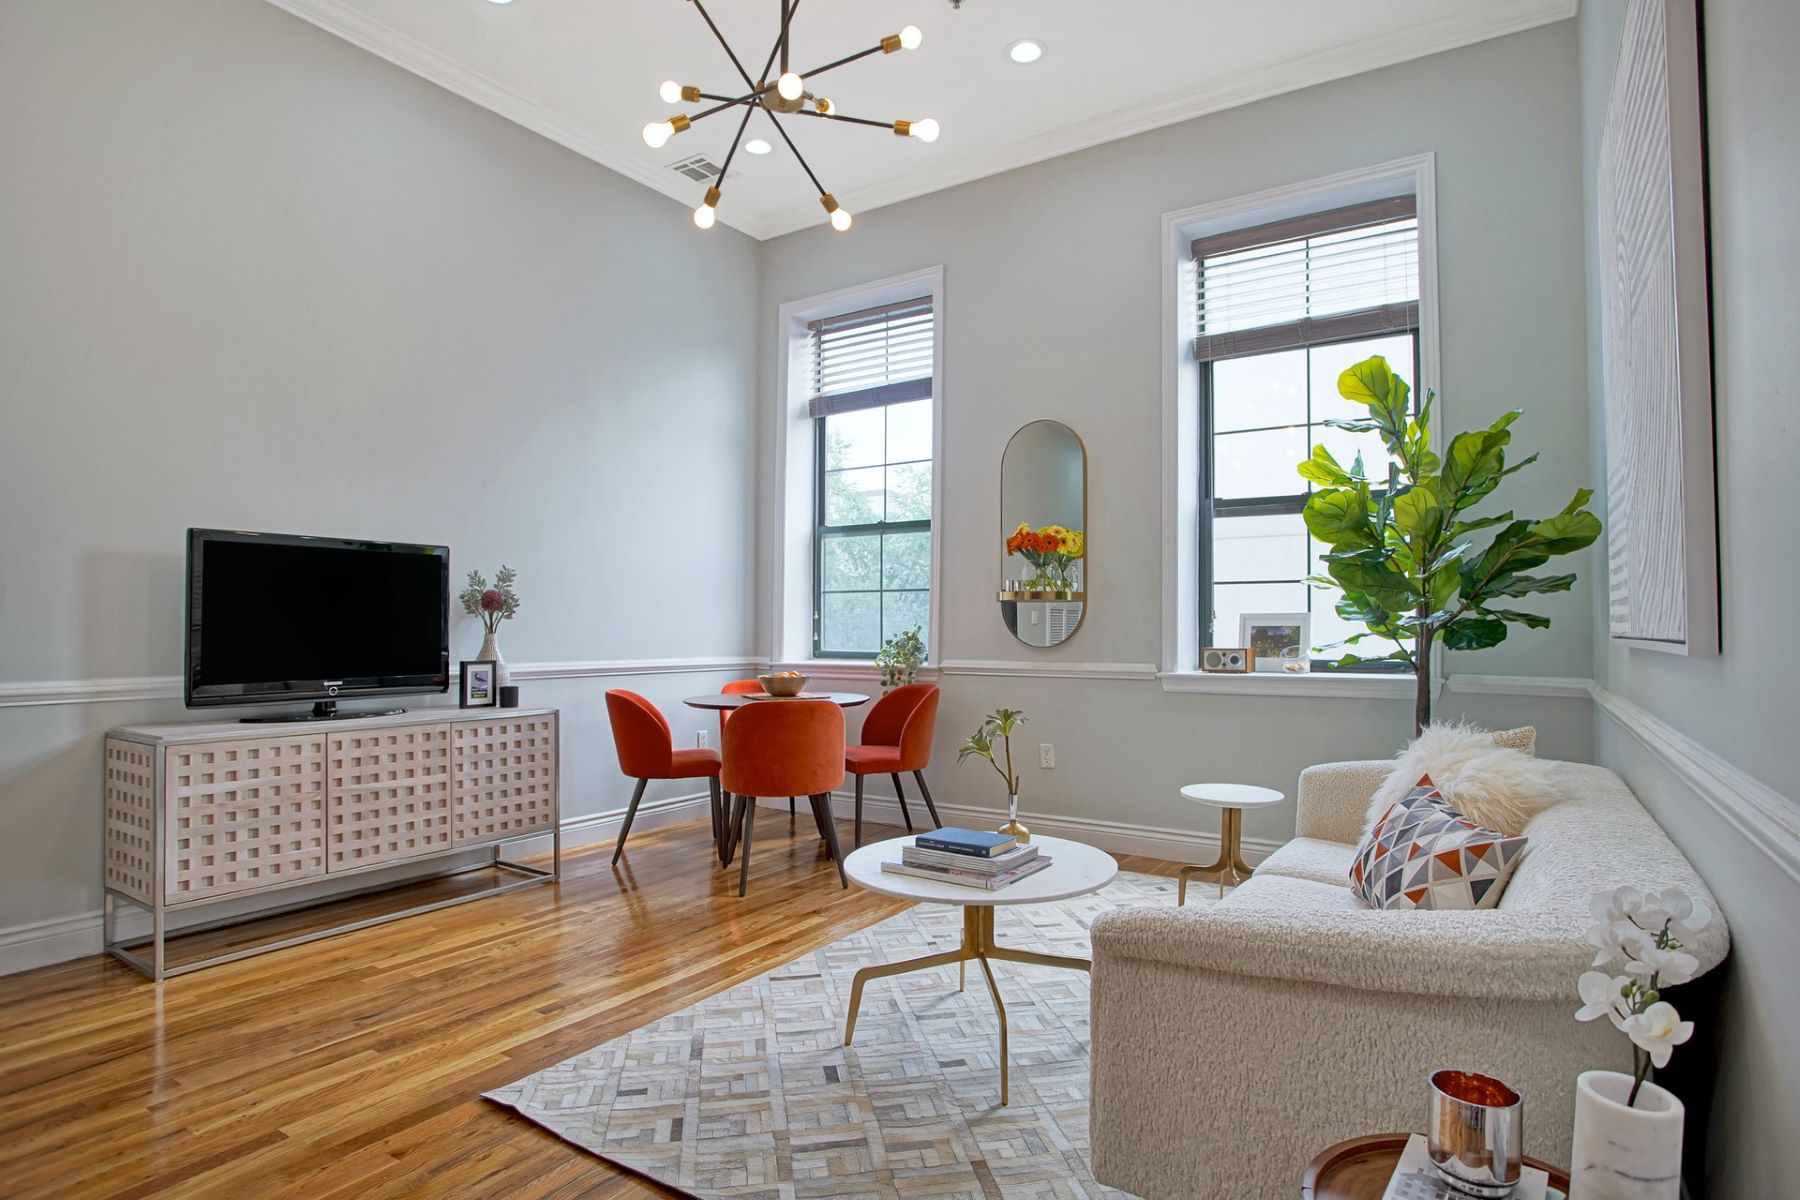 Condominiums للـ Sale في Introducing this great value 2B/2B in Hoboken 729 Madison Street #2B, Hoboken, New Jersey 07030 United States